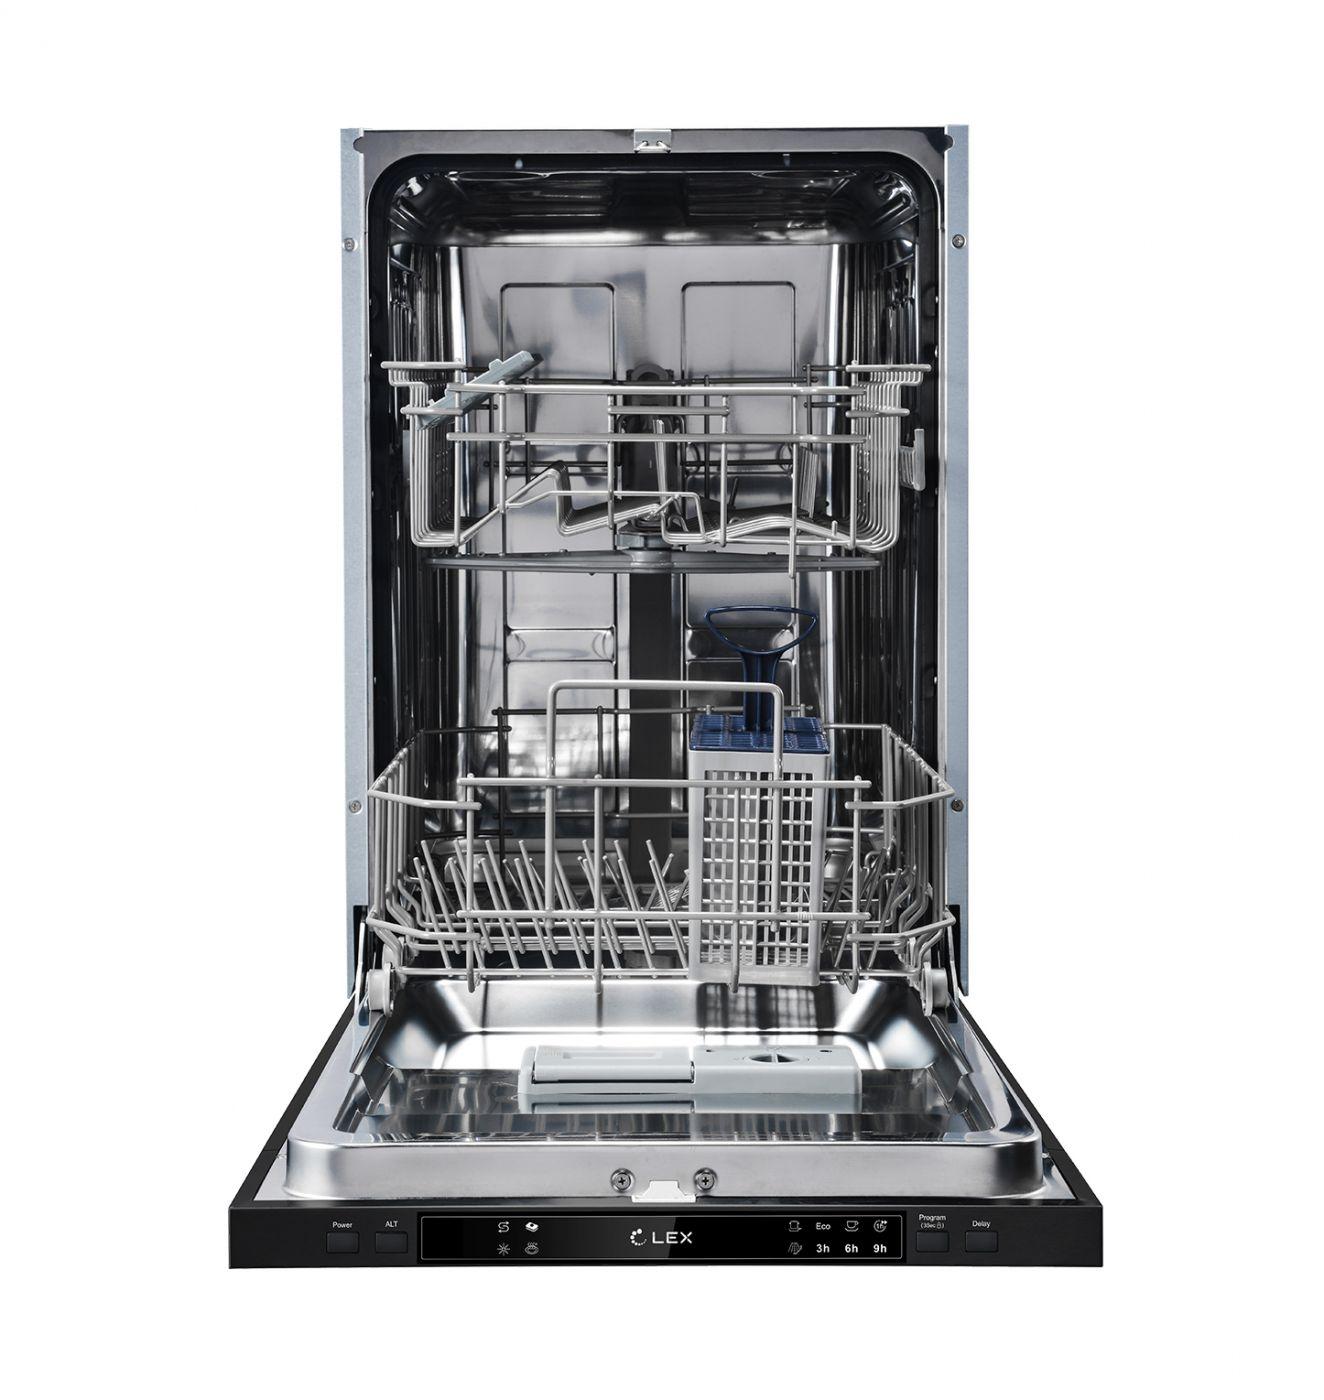 Посудомоечная машина LEX PM 4552 (CHGA000001)